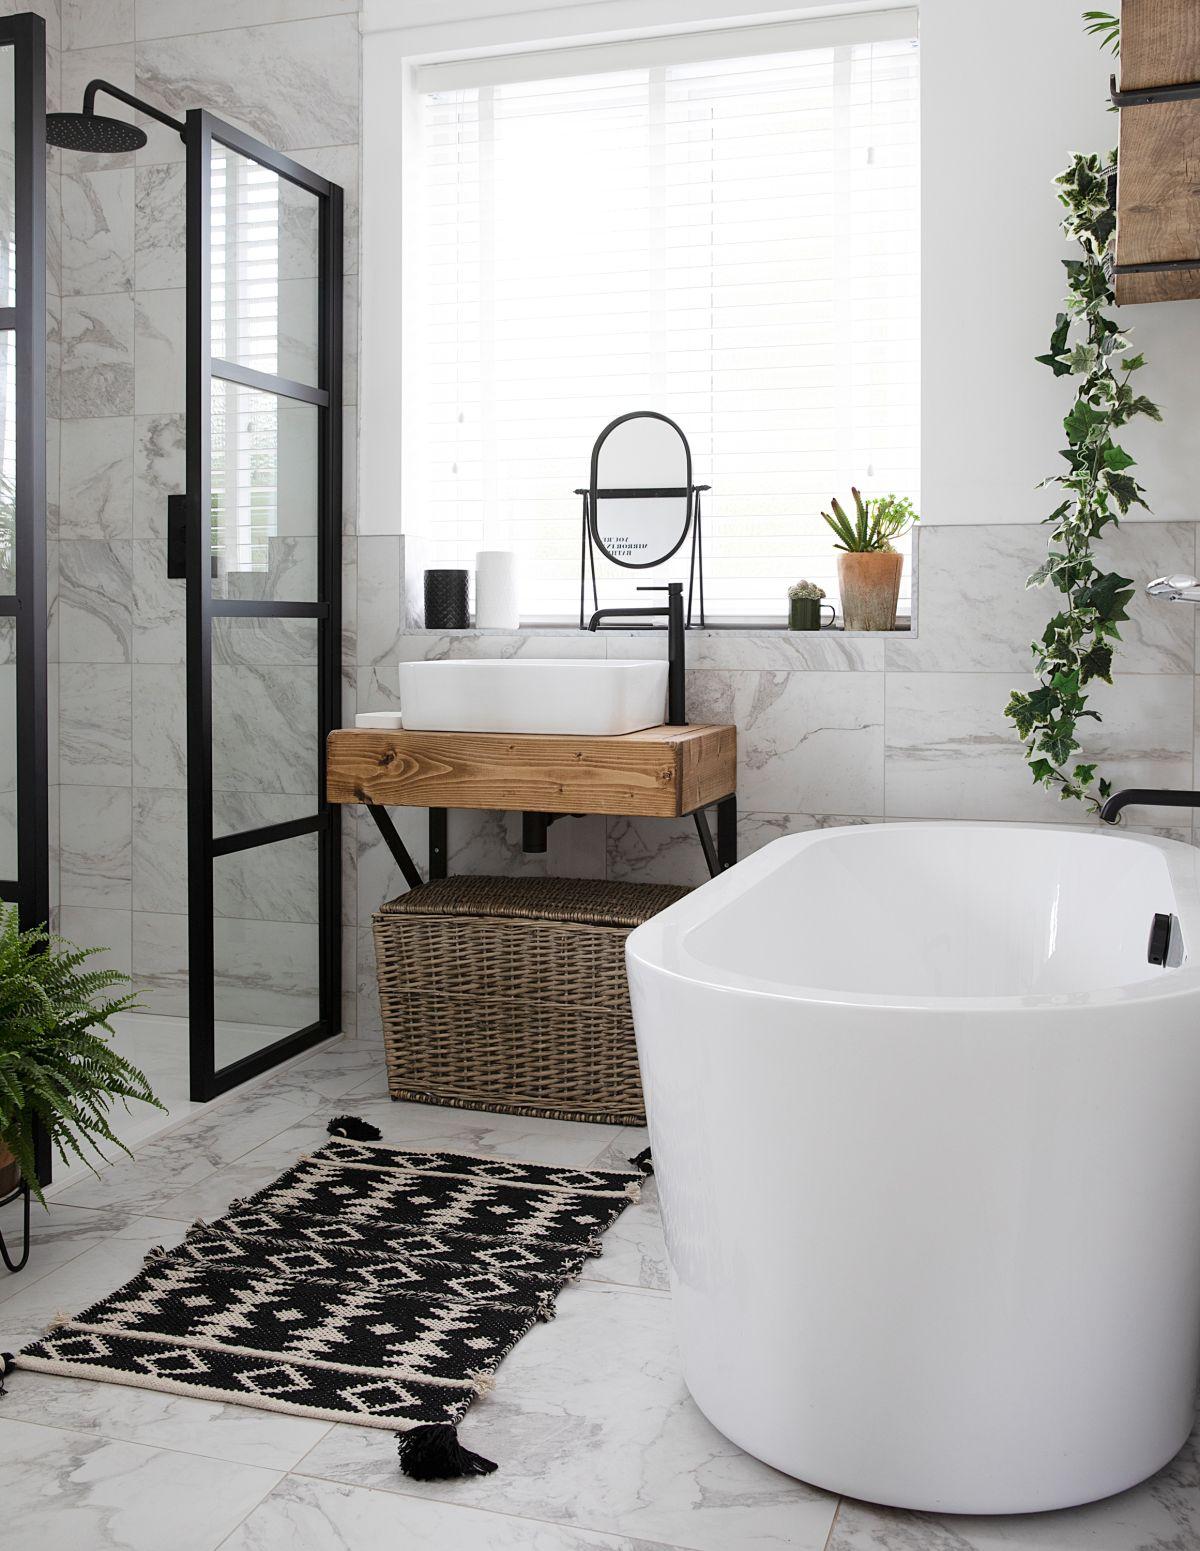 22 Small Bathroom Storage Ideas How